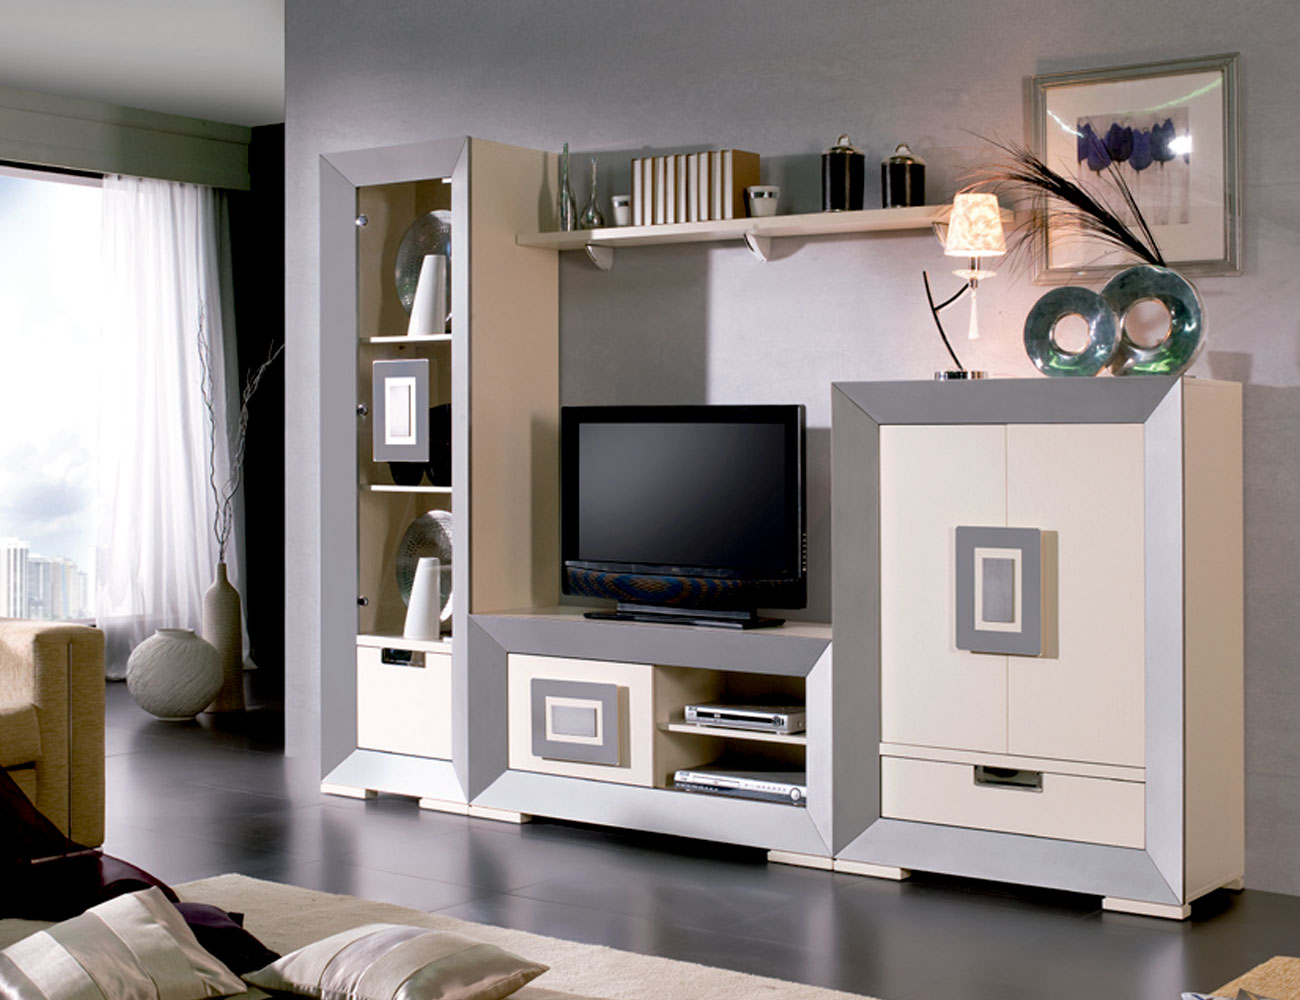 Mueble salon neoclasico color 504 503 tirador acero4